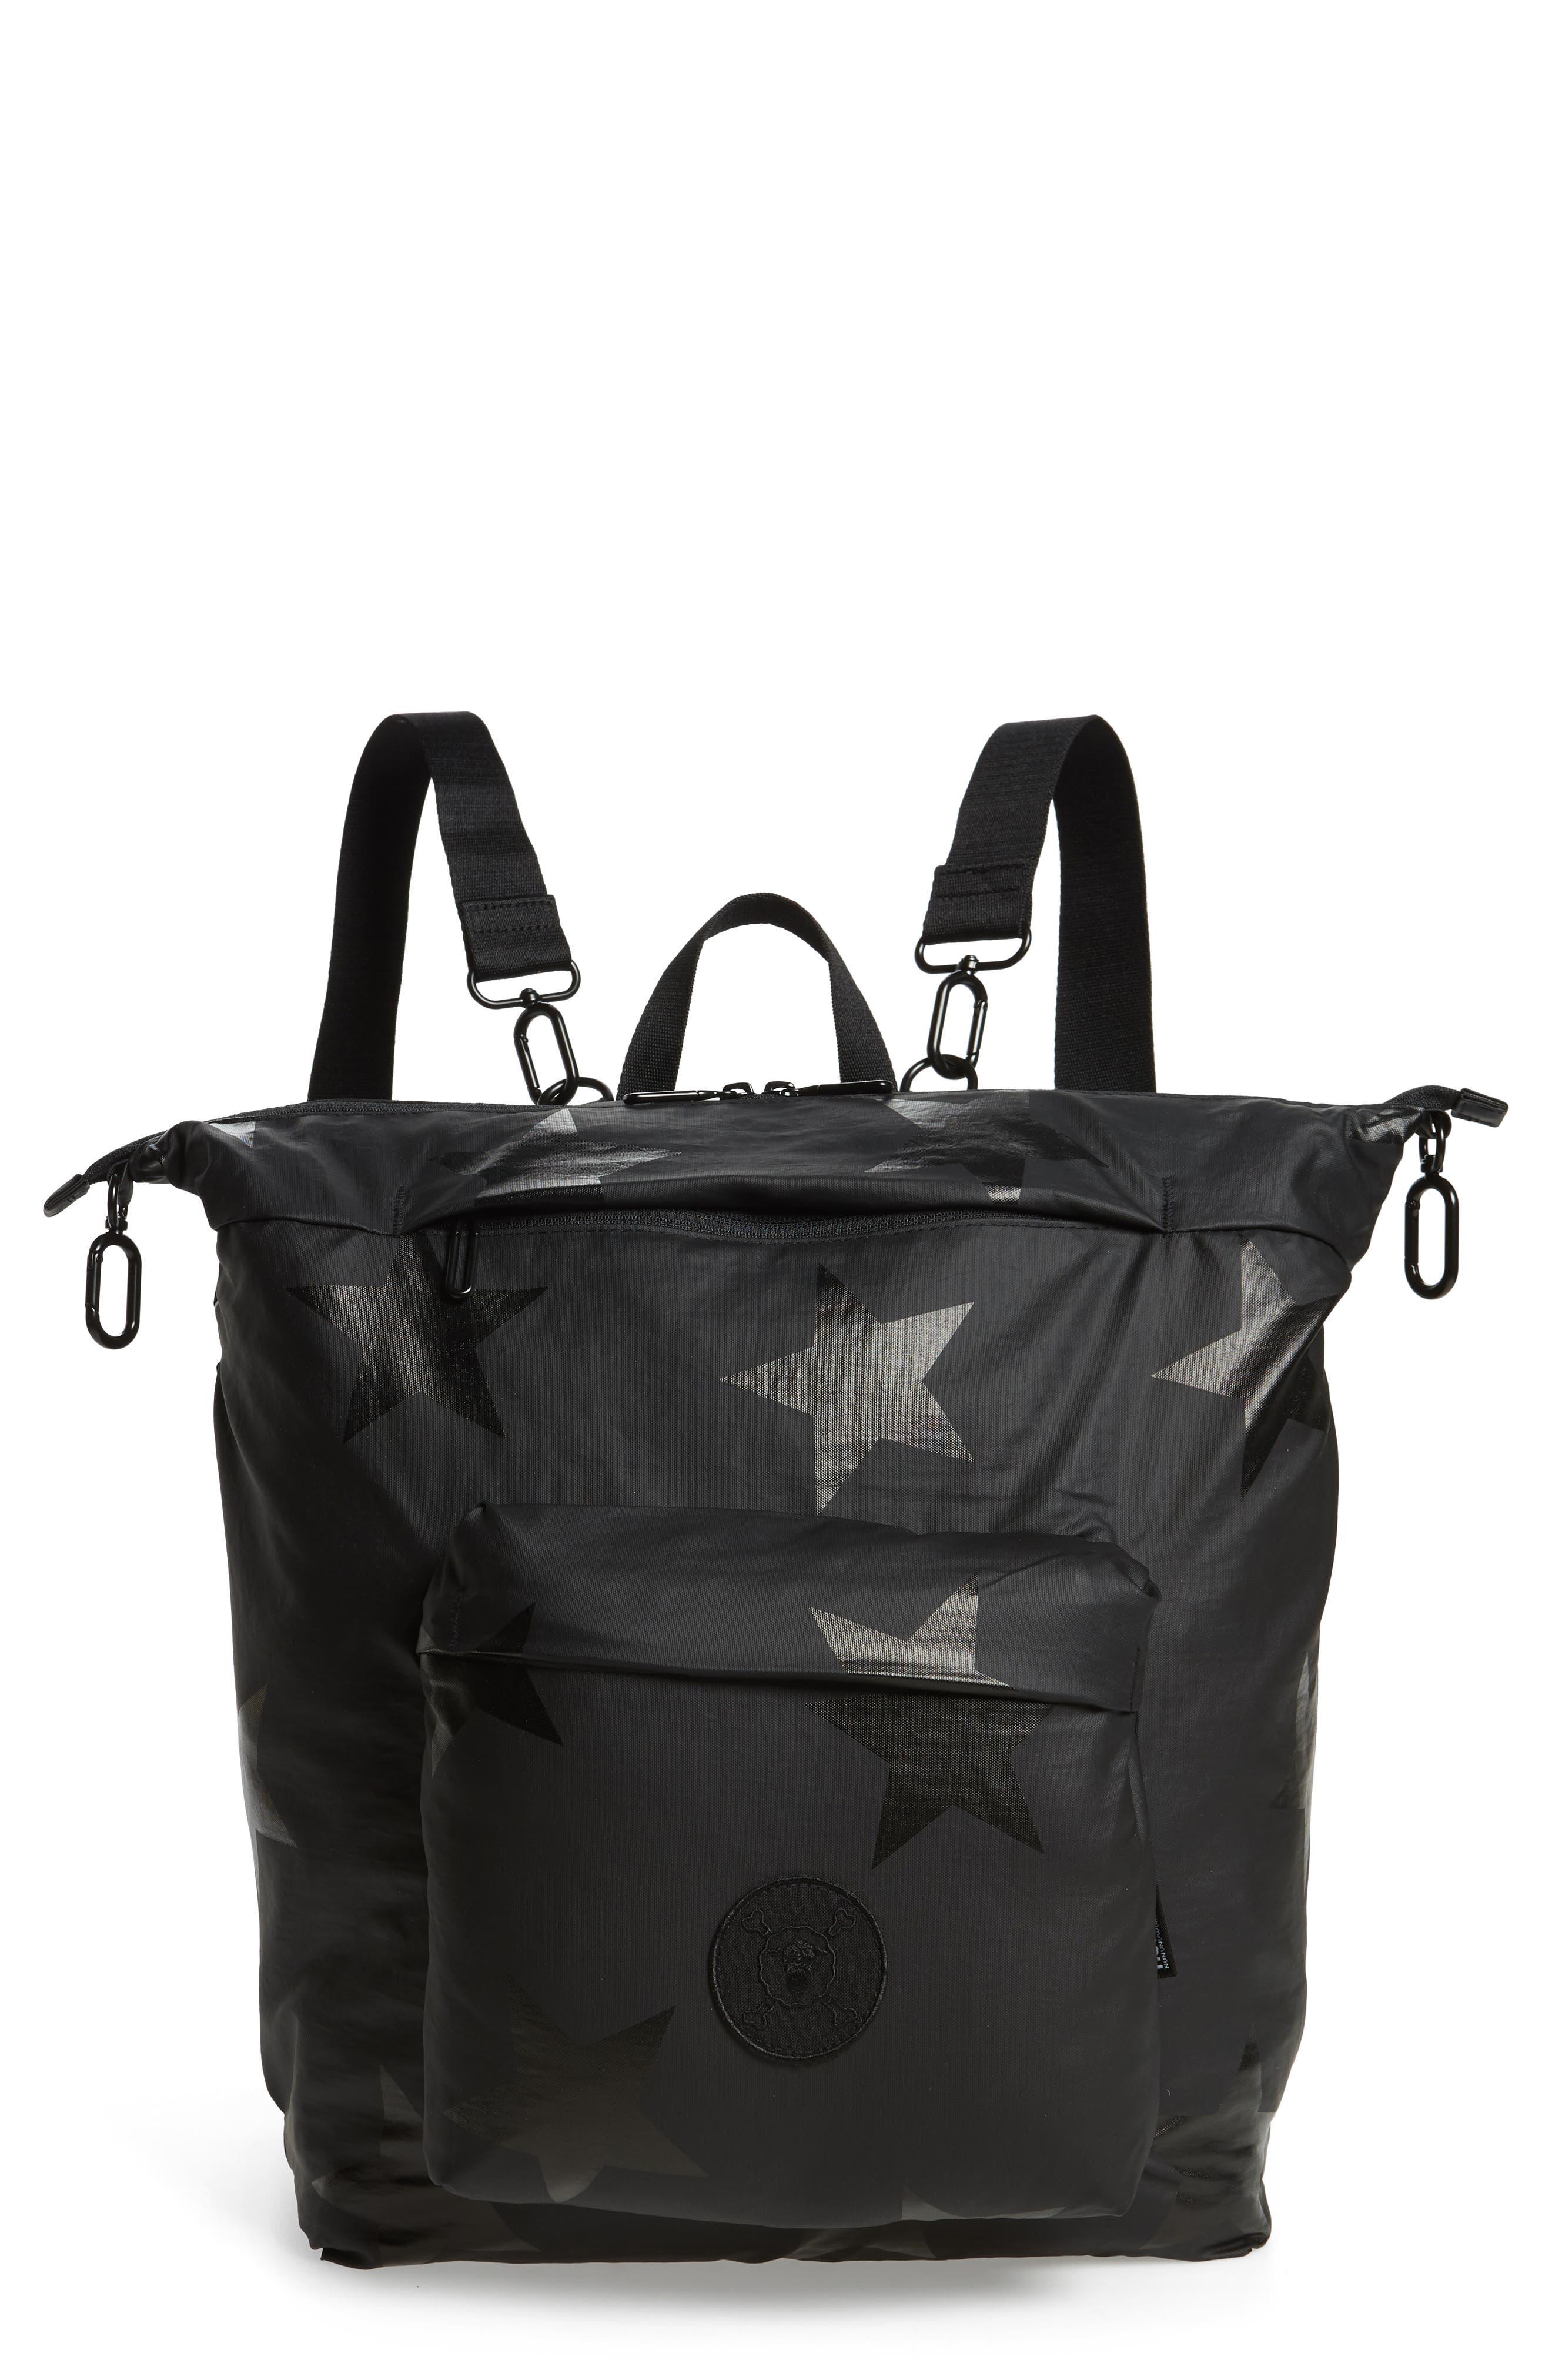 +one duo Nylon Convertible Diaper Bag,                             Main thumbnail 1, color,                             BLACK STAR